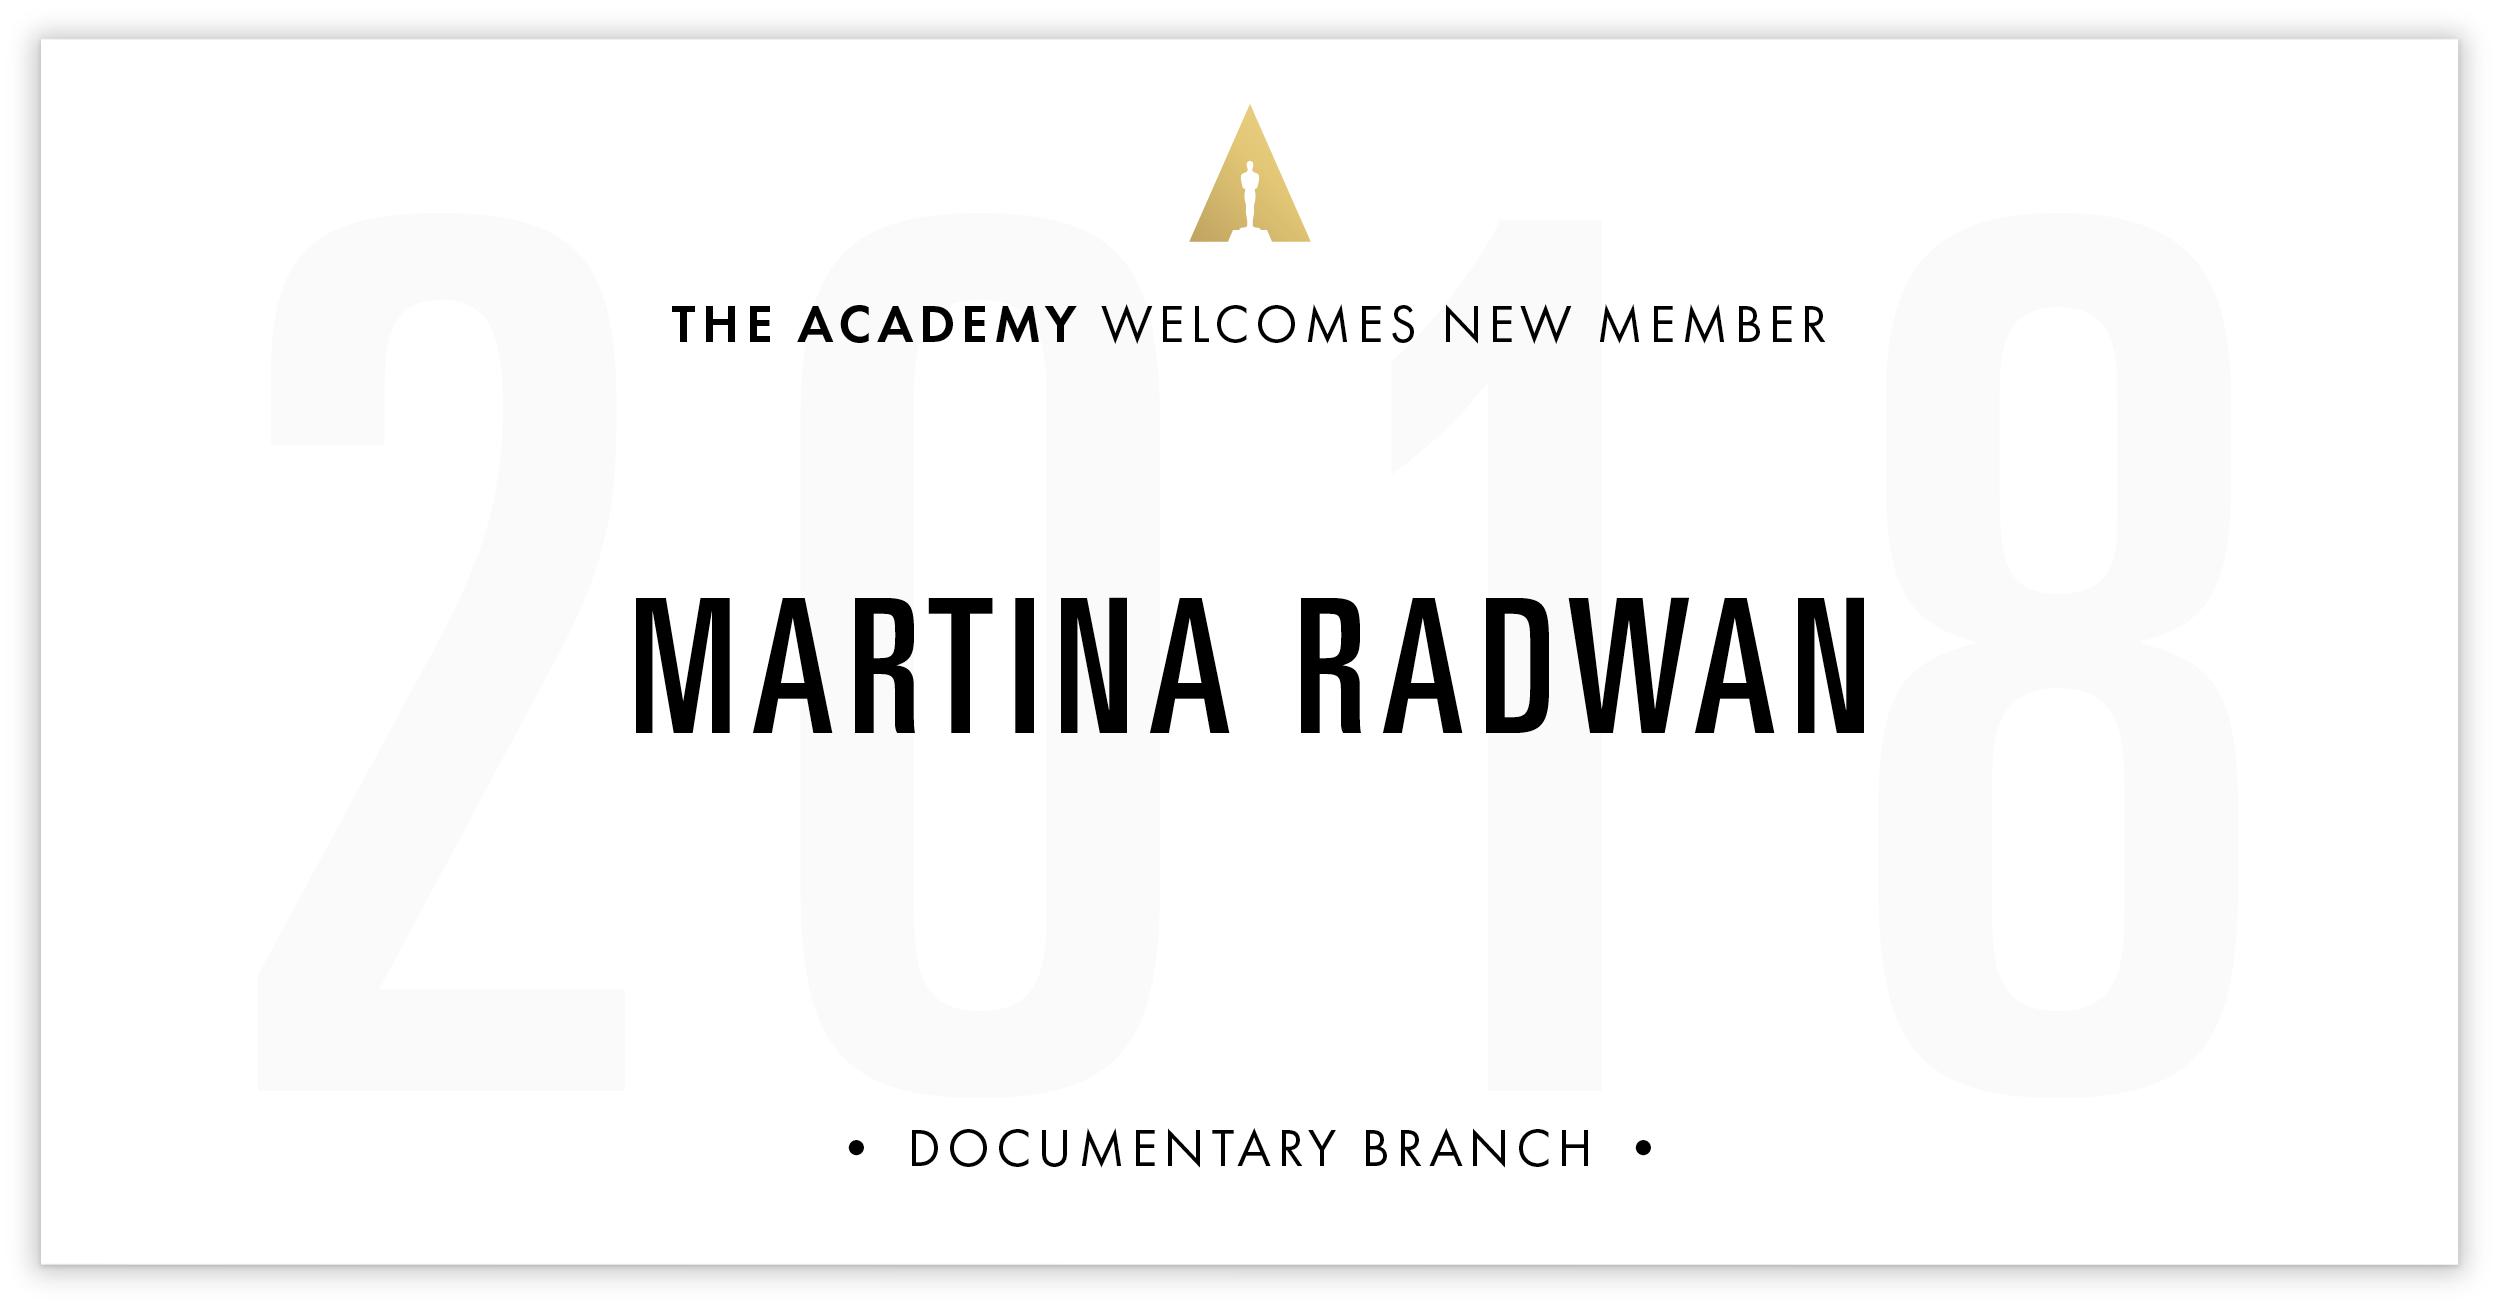 Martina Radwan is invited!